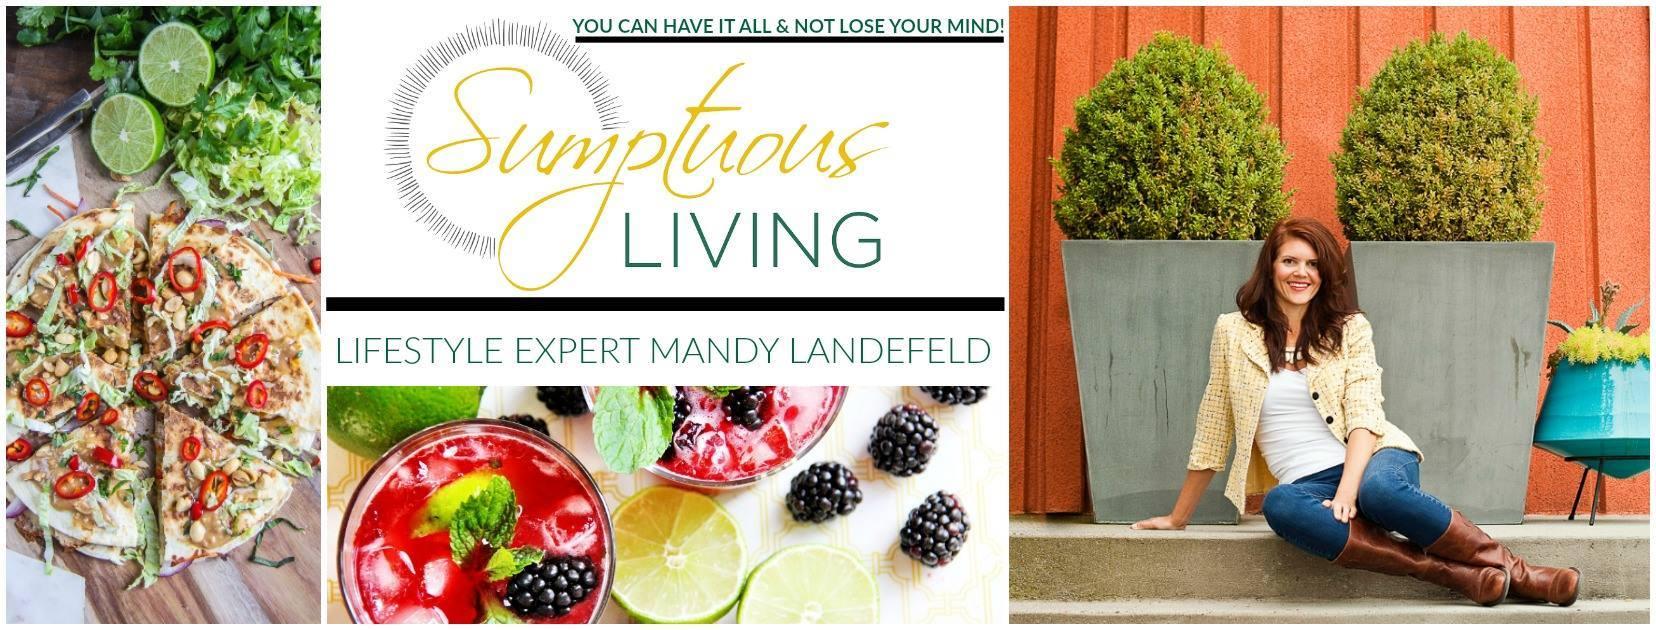 lifestyle expert, sumptuous living, interior design, home decor, hosting parties, home management